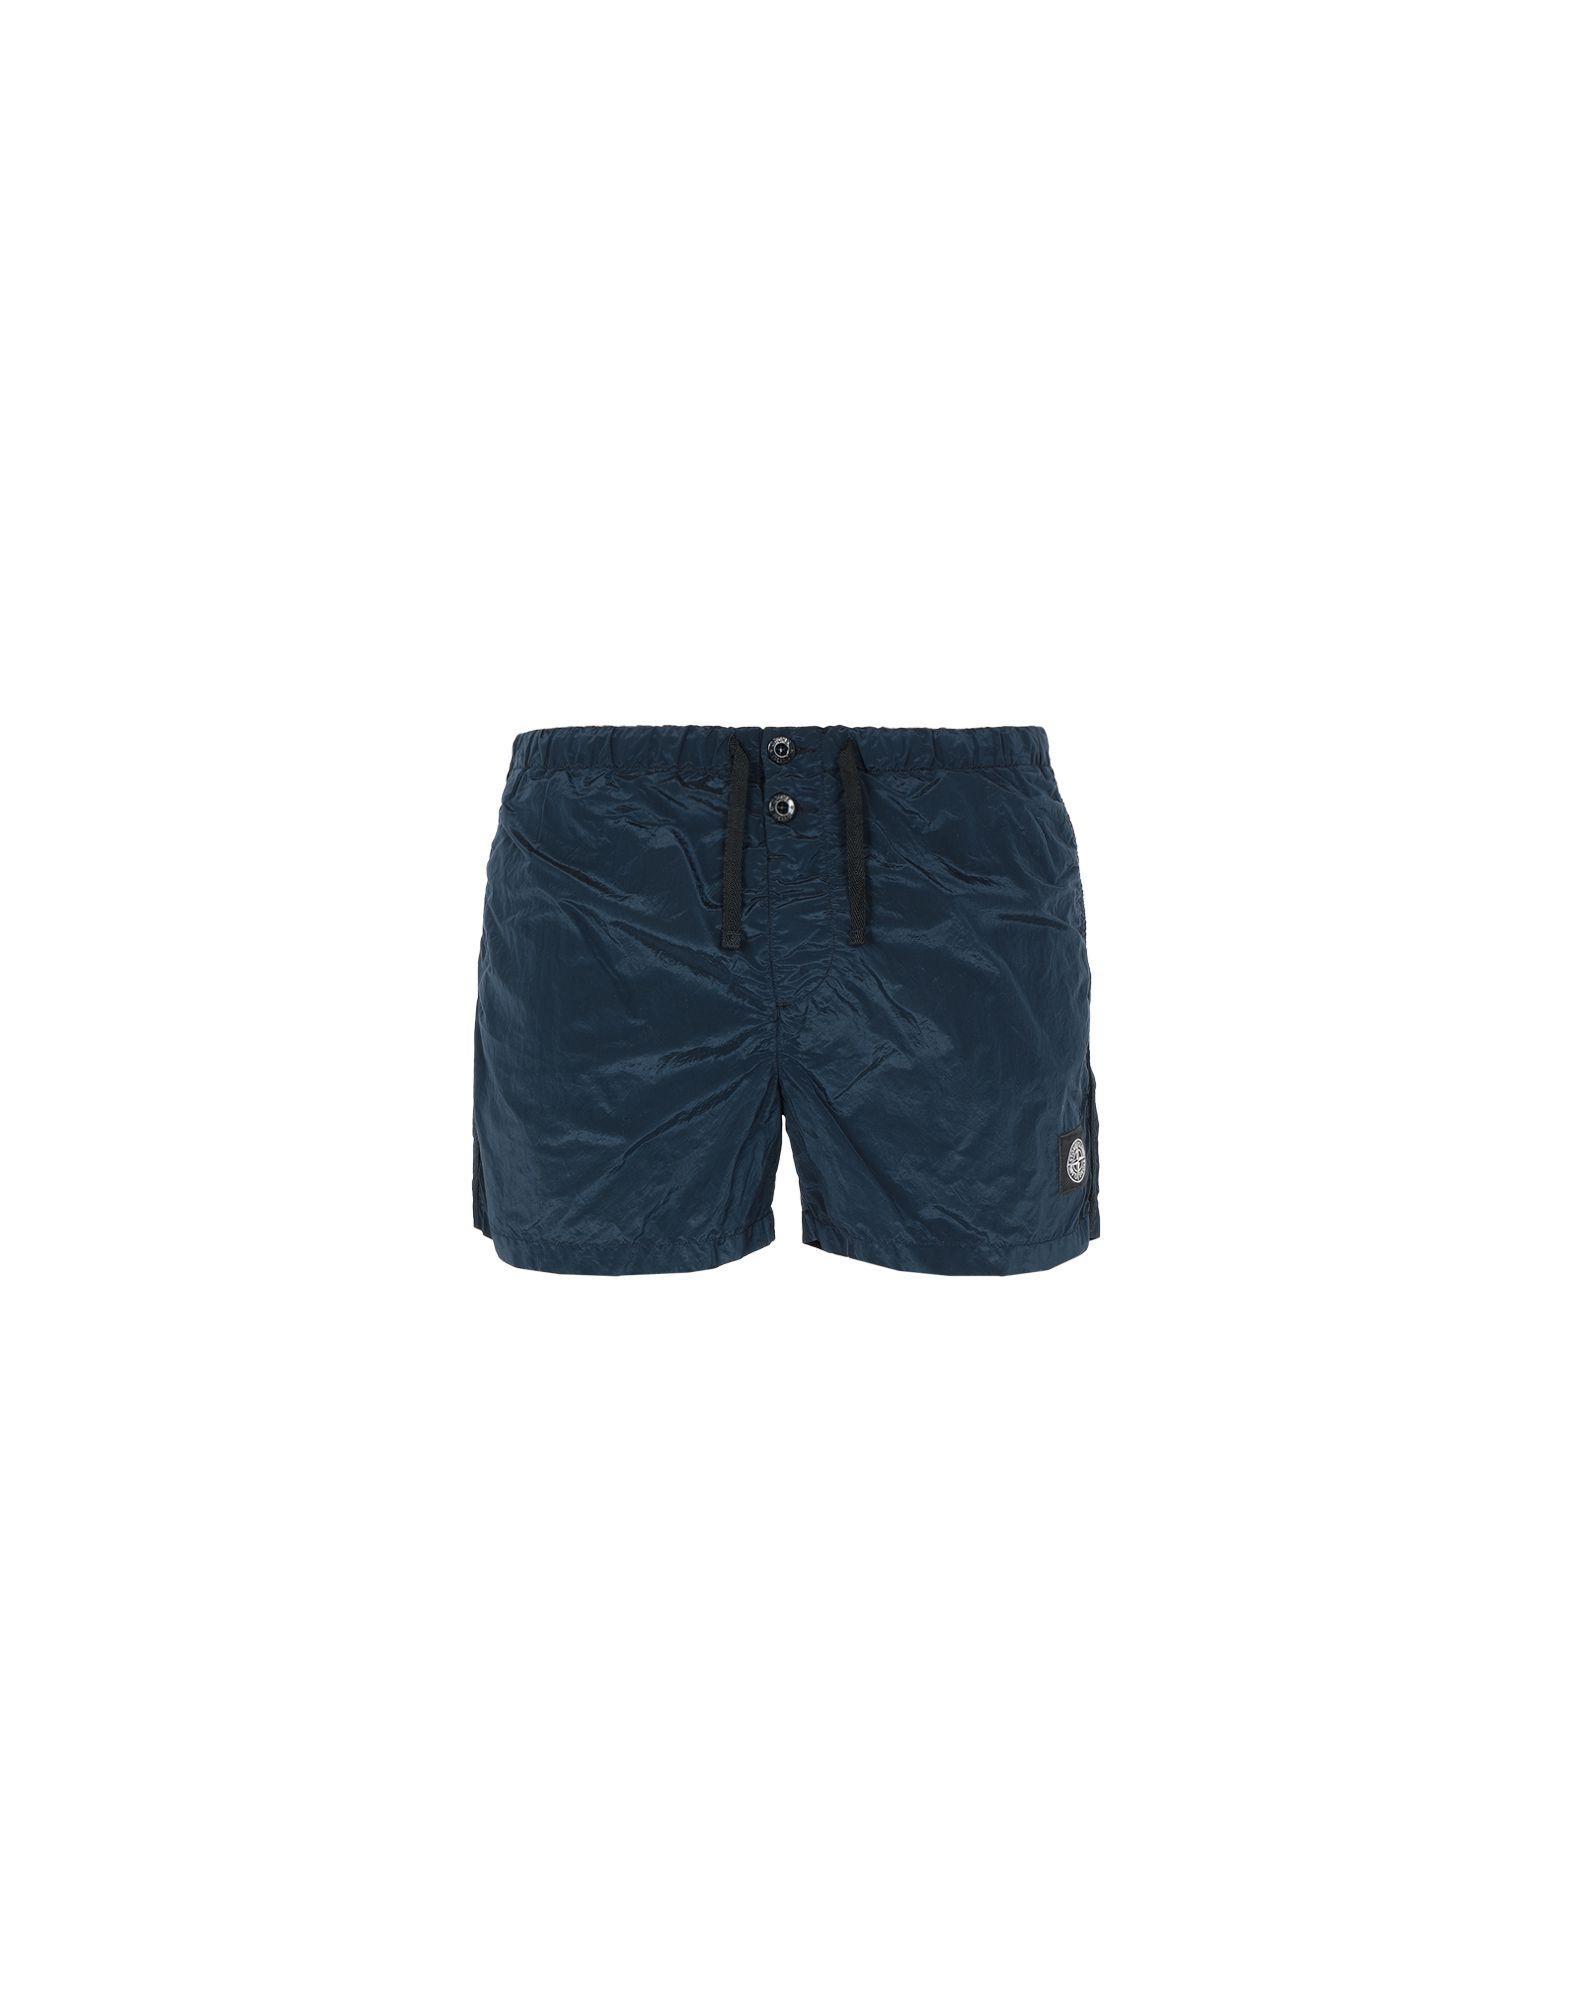 83cc22a755e0a Stone Island B0643 Nylon Metal in Blue for Men - Lyst